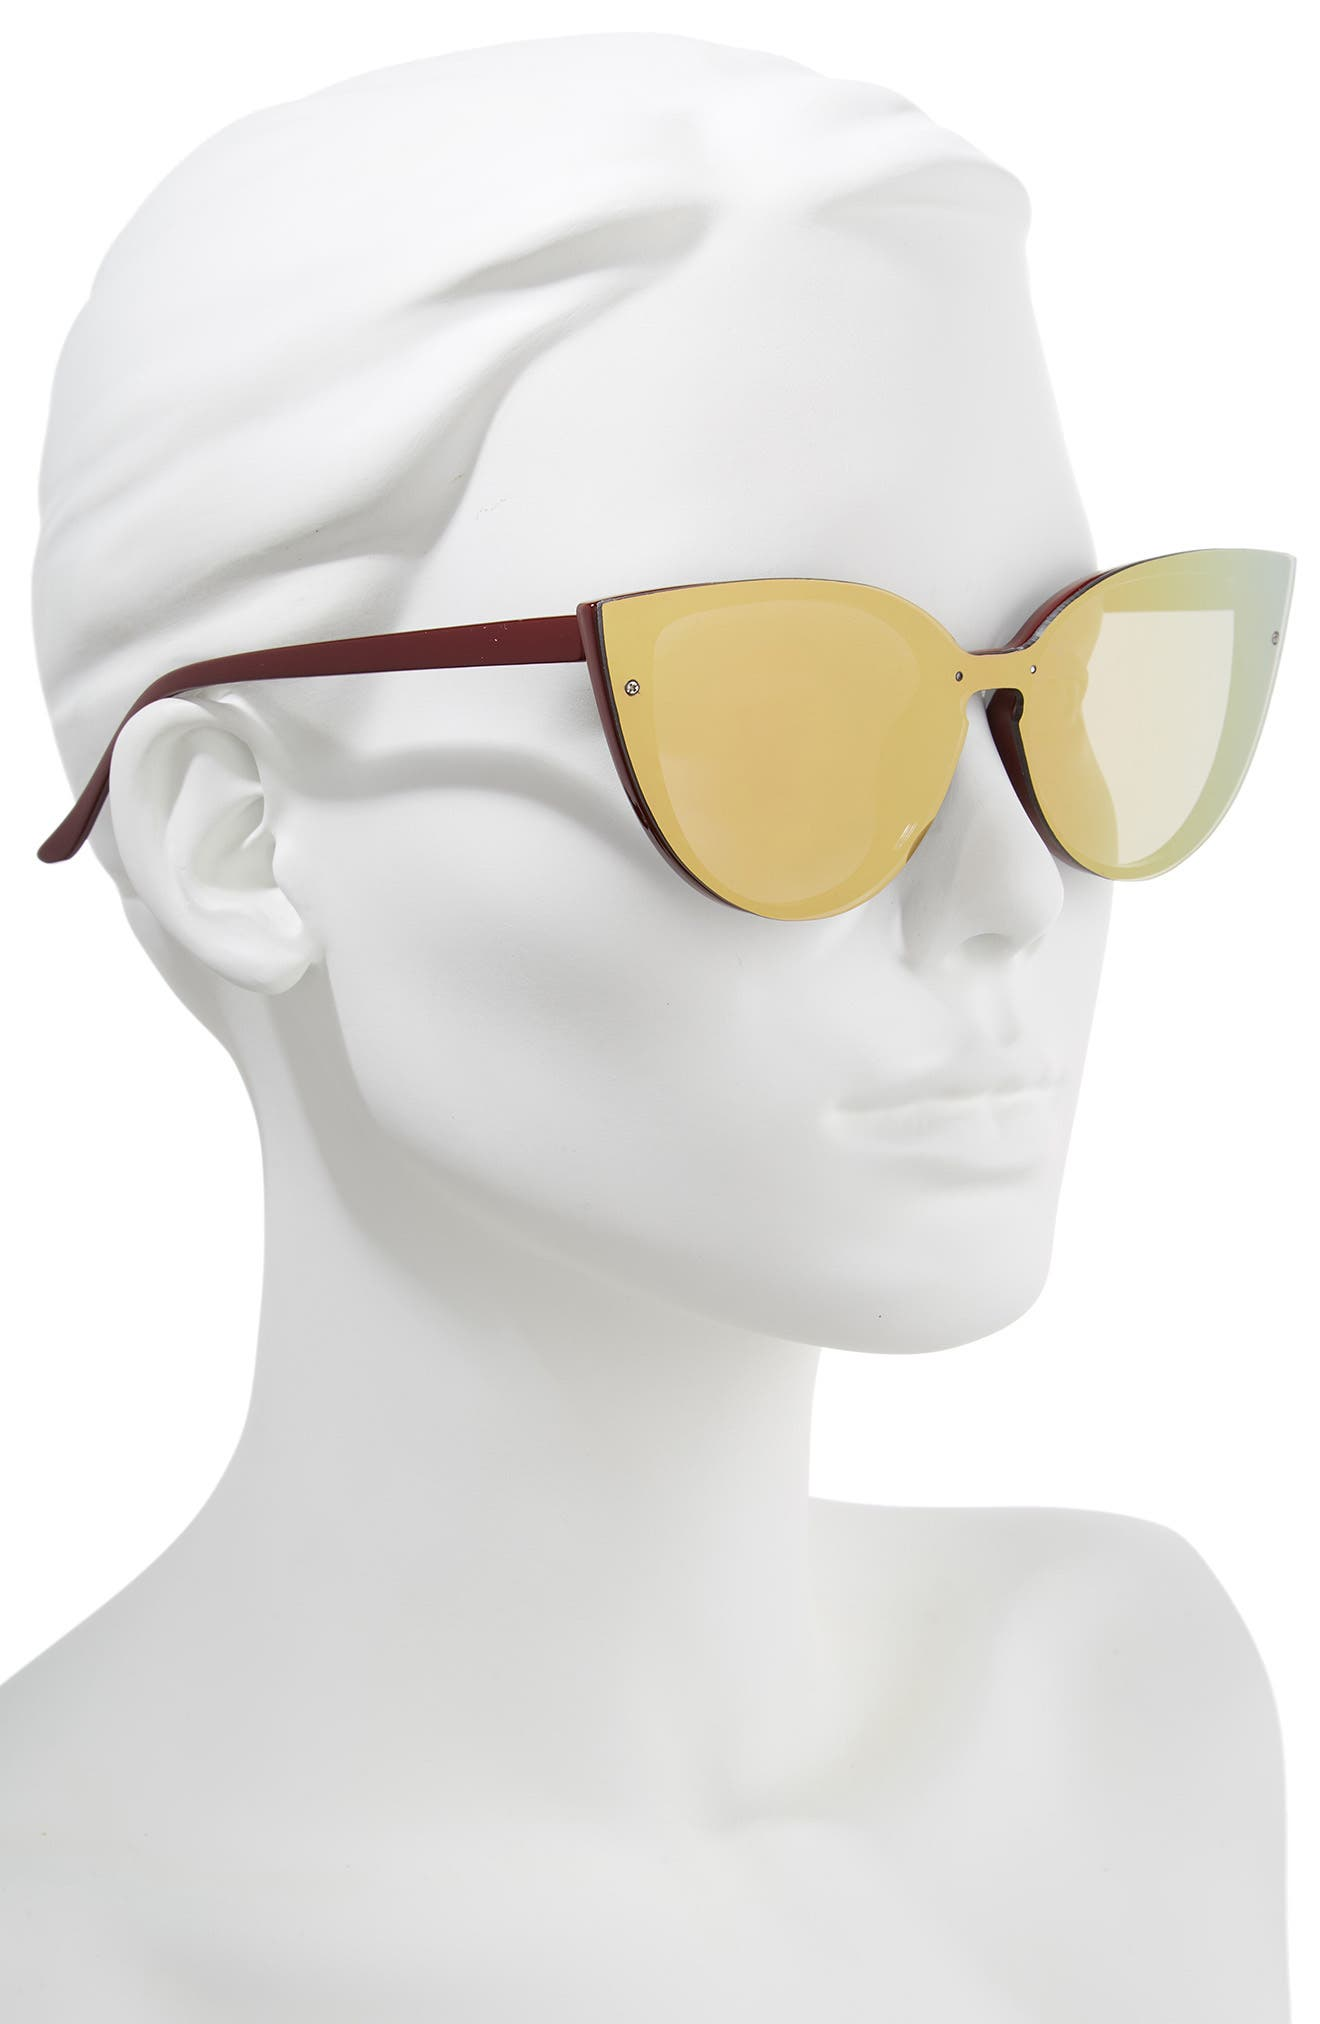 52mm Flat Cat Eye Sunglasses,                             Alternate thumbnail 2, color,                             Burgundy/ Green